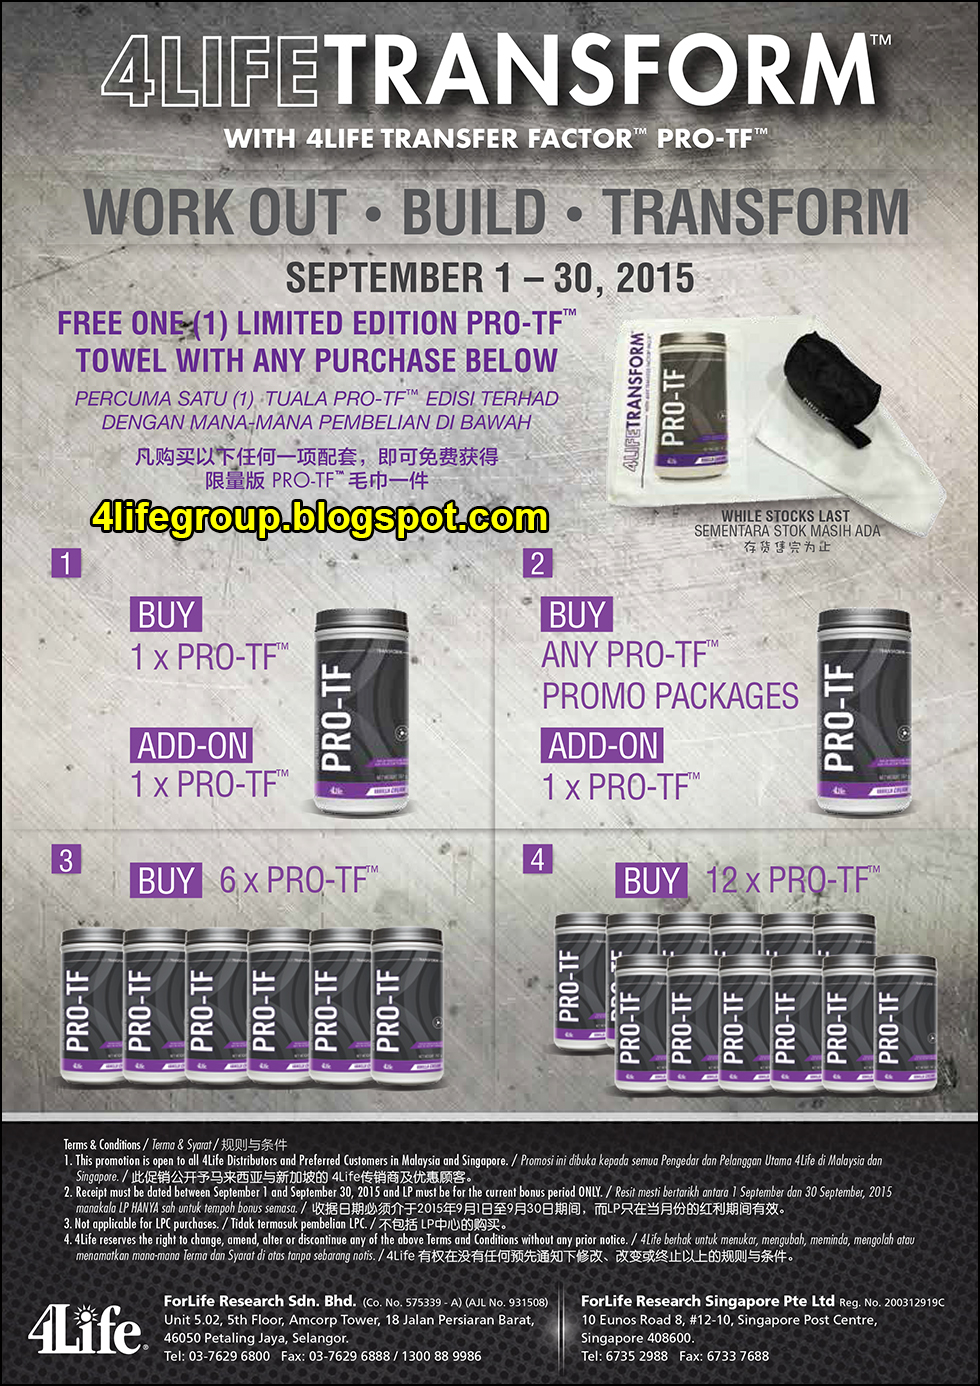 foto 4Life Transfer Factor™ PRO-TF™ September Promo